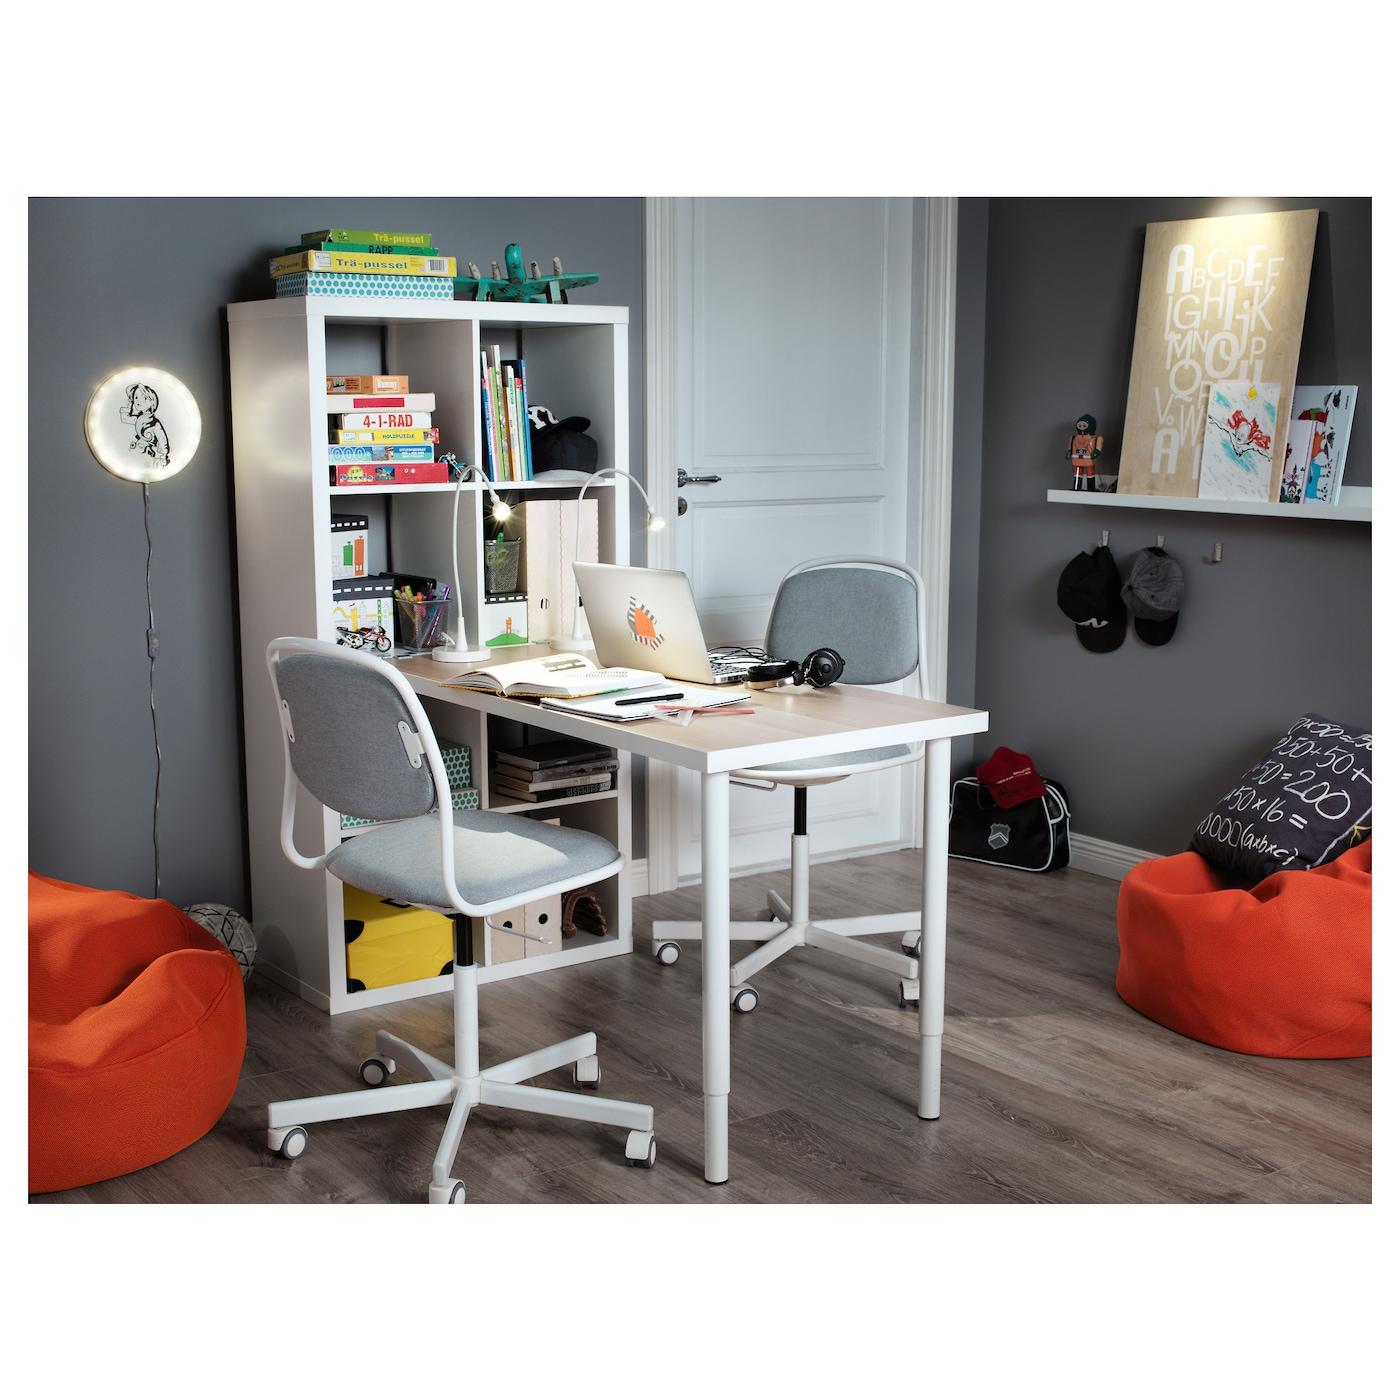 Olov Pied Reglable Blanc Ikea